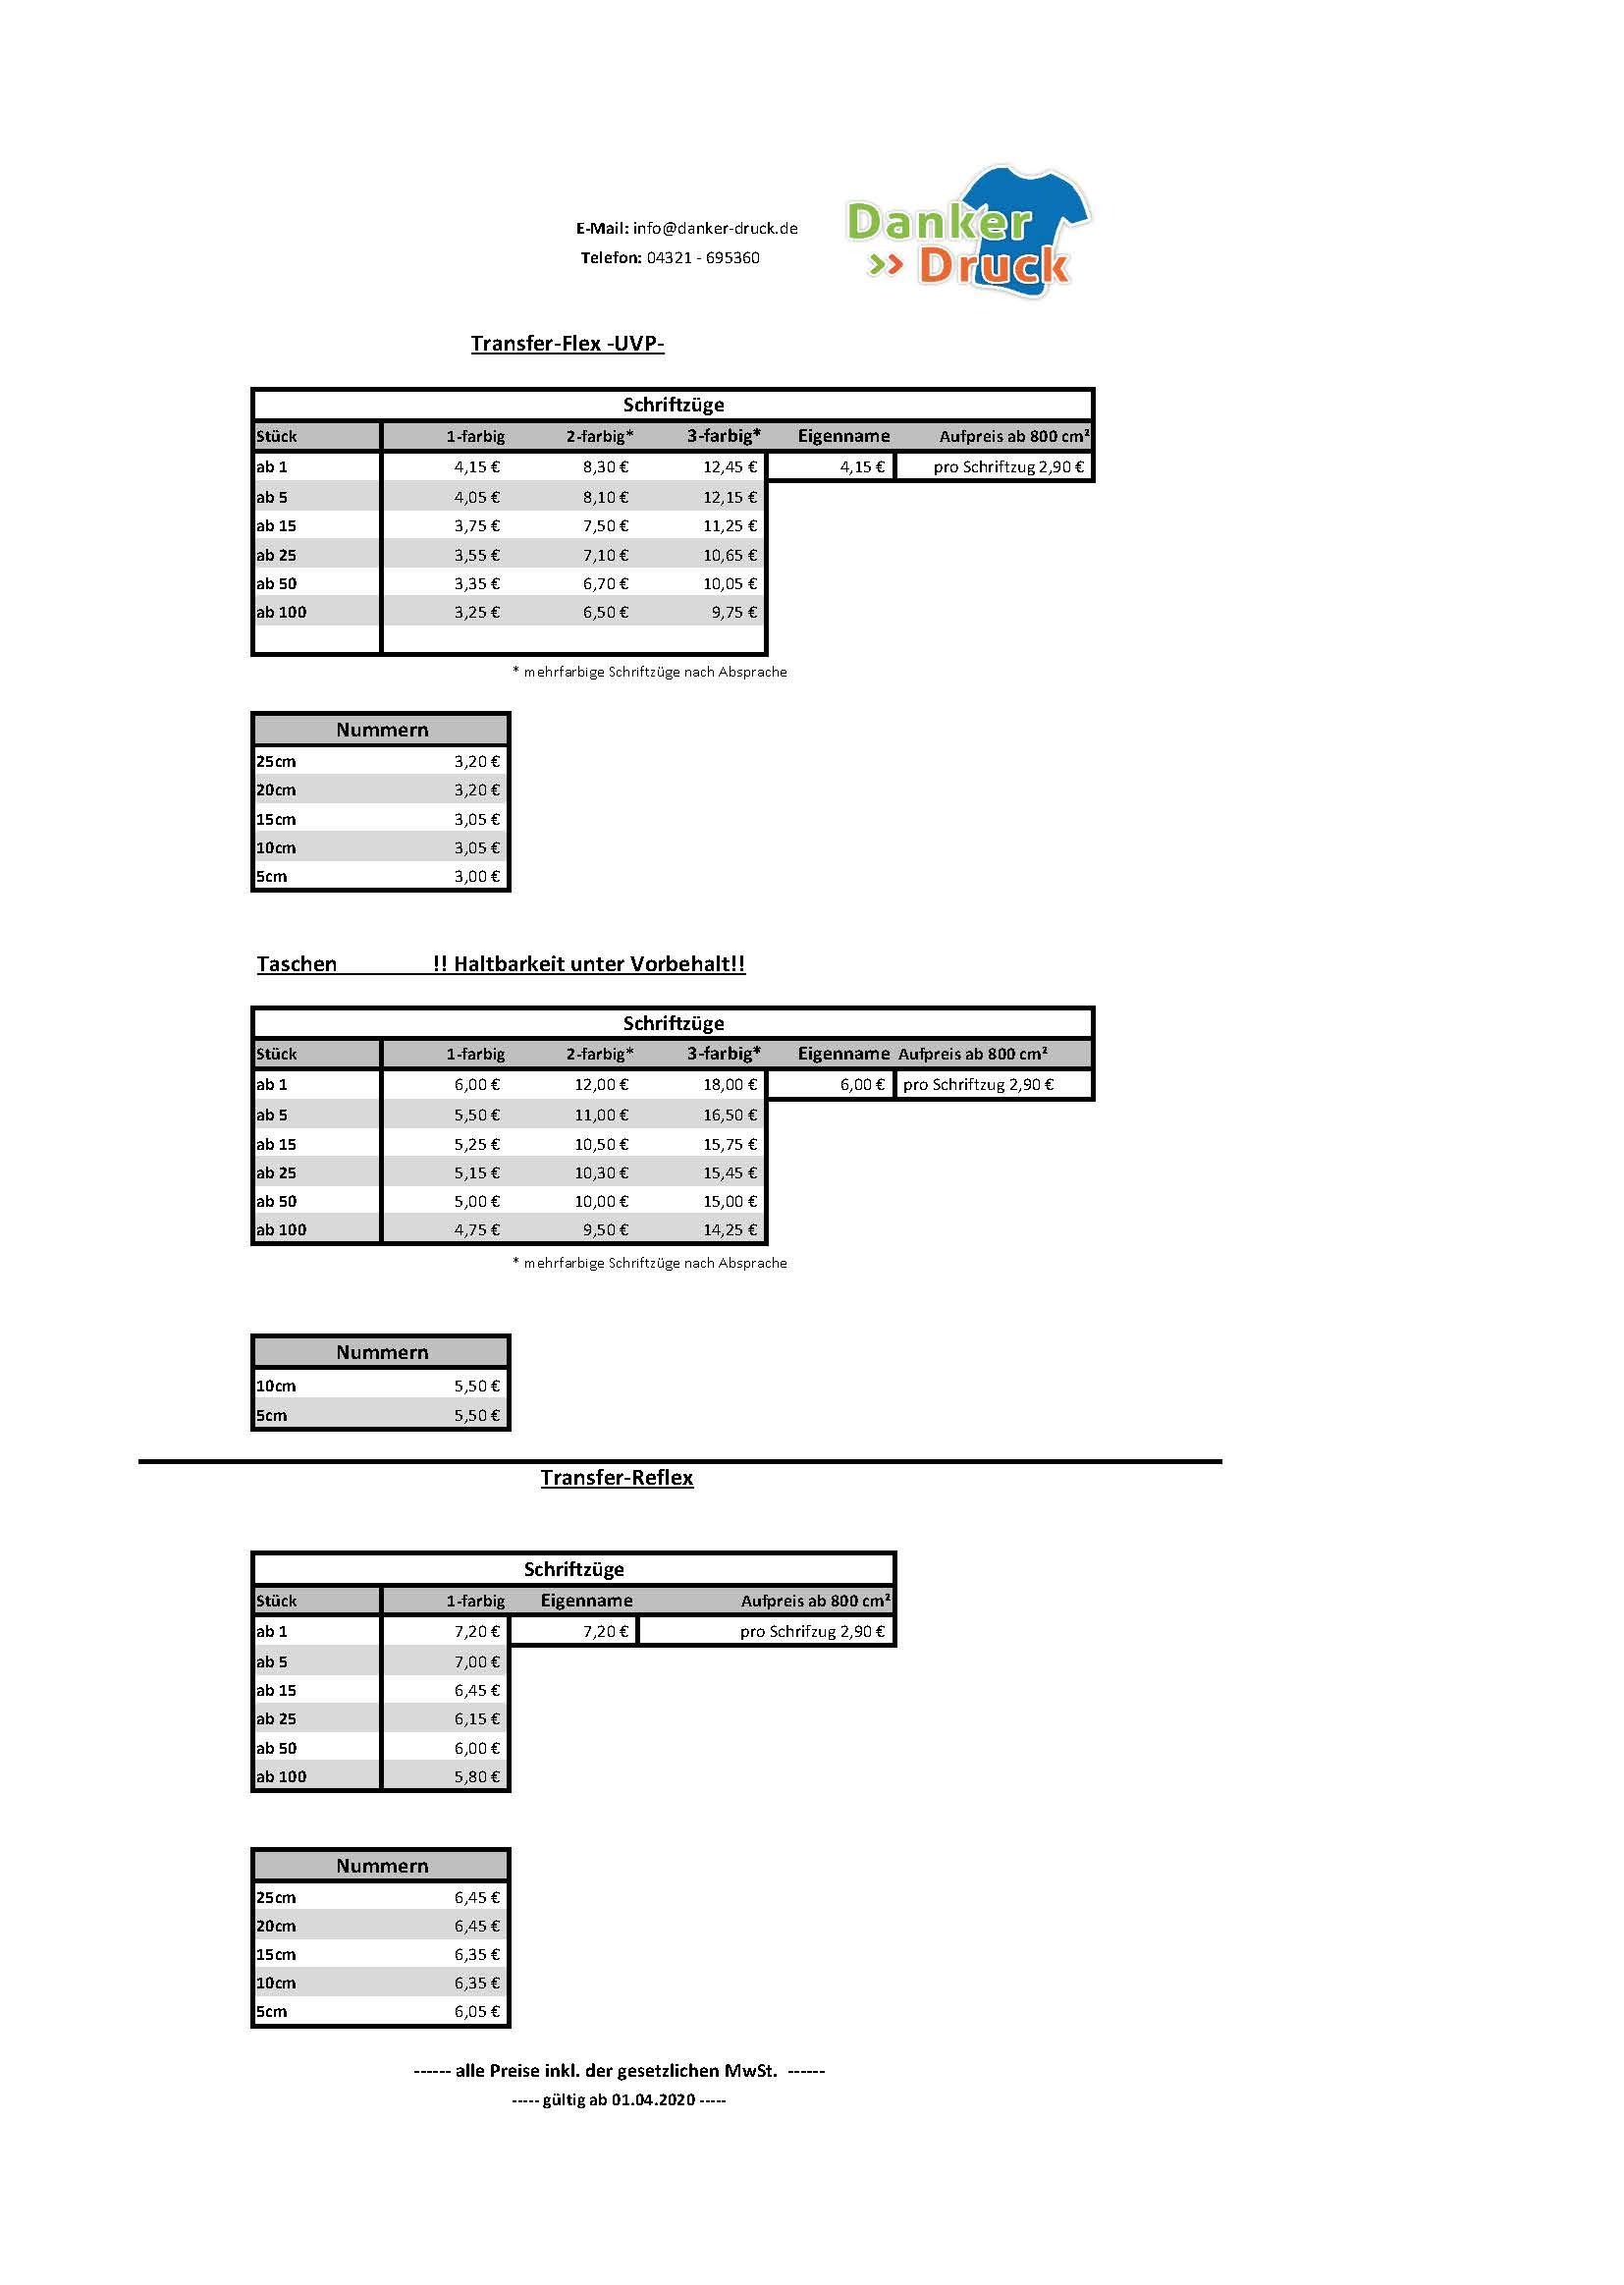 Transfer-Flex_B2C_01-04-2020